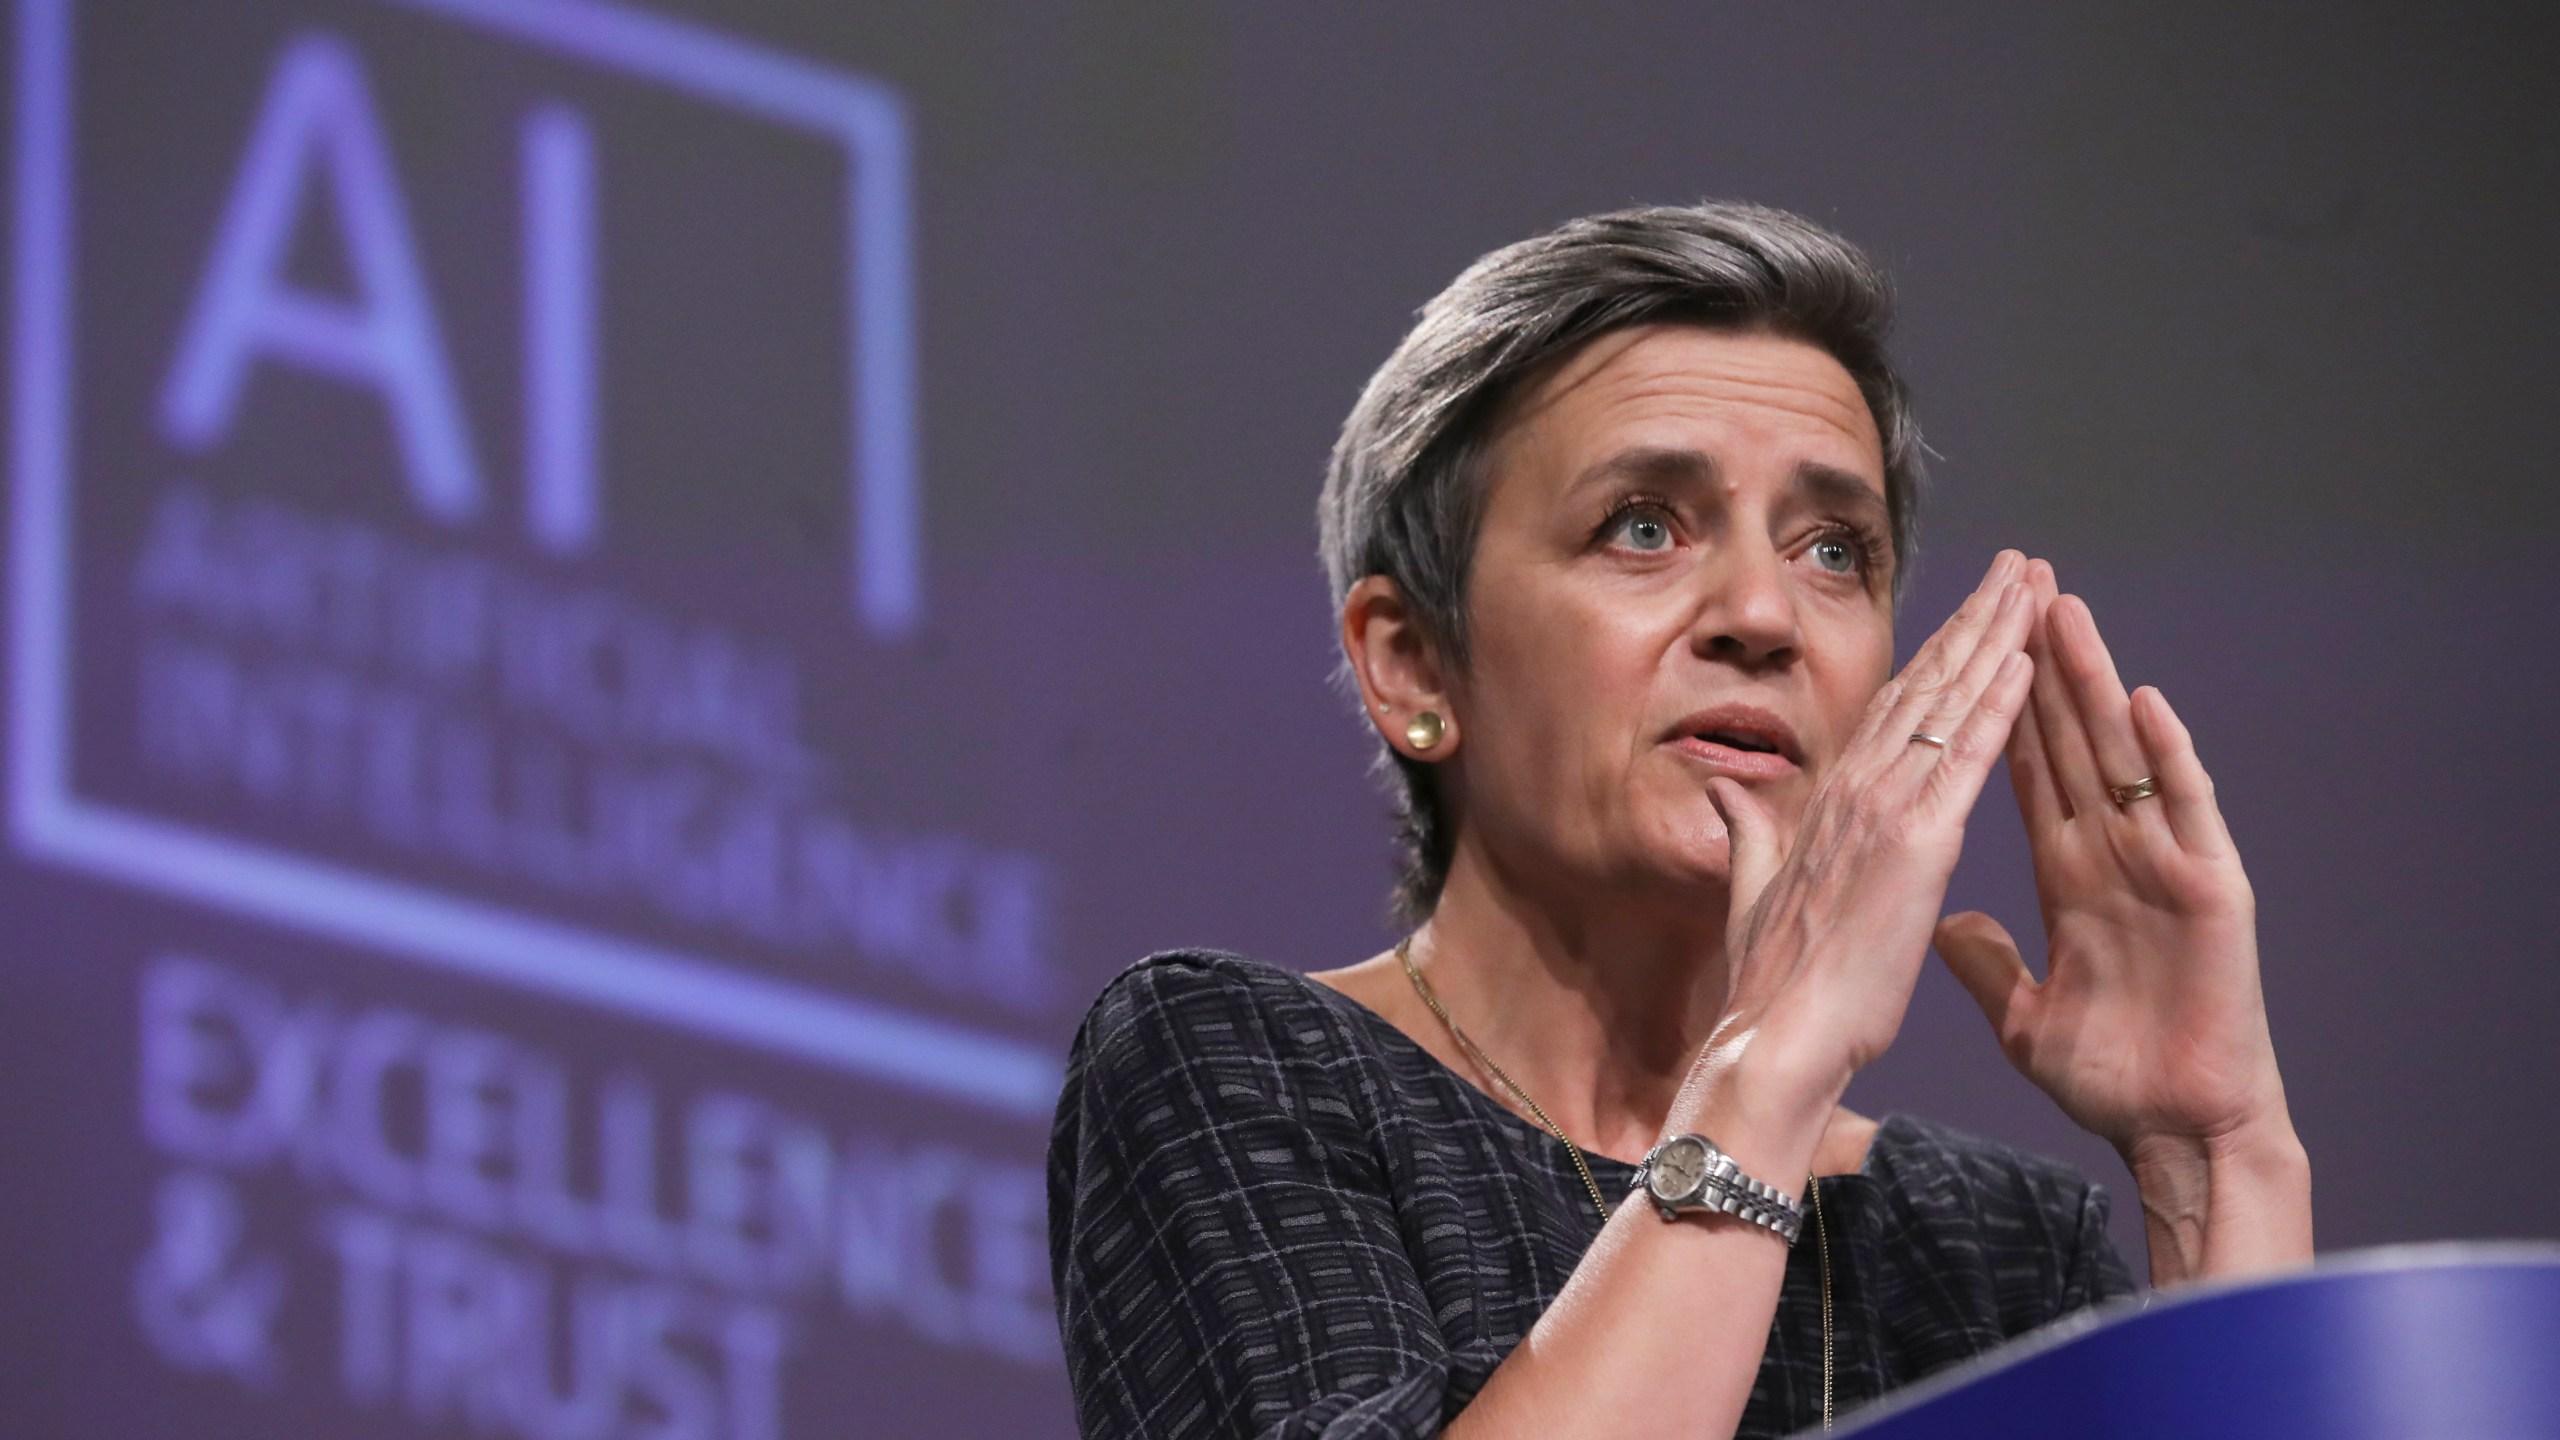 EU Commission presser artificial intelligence